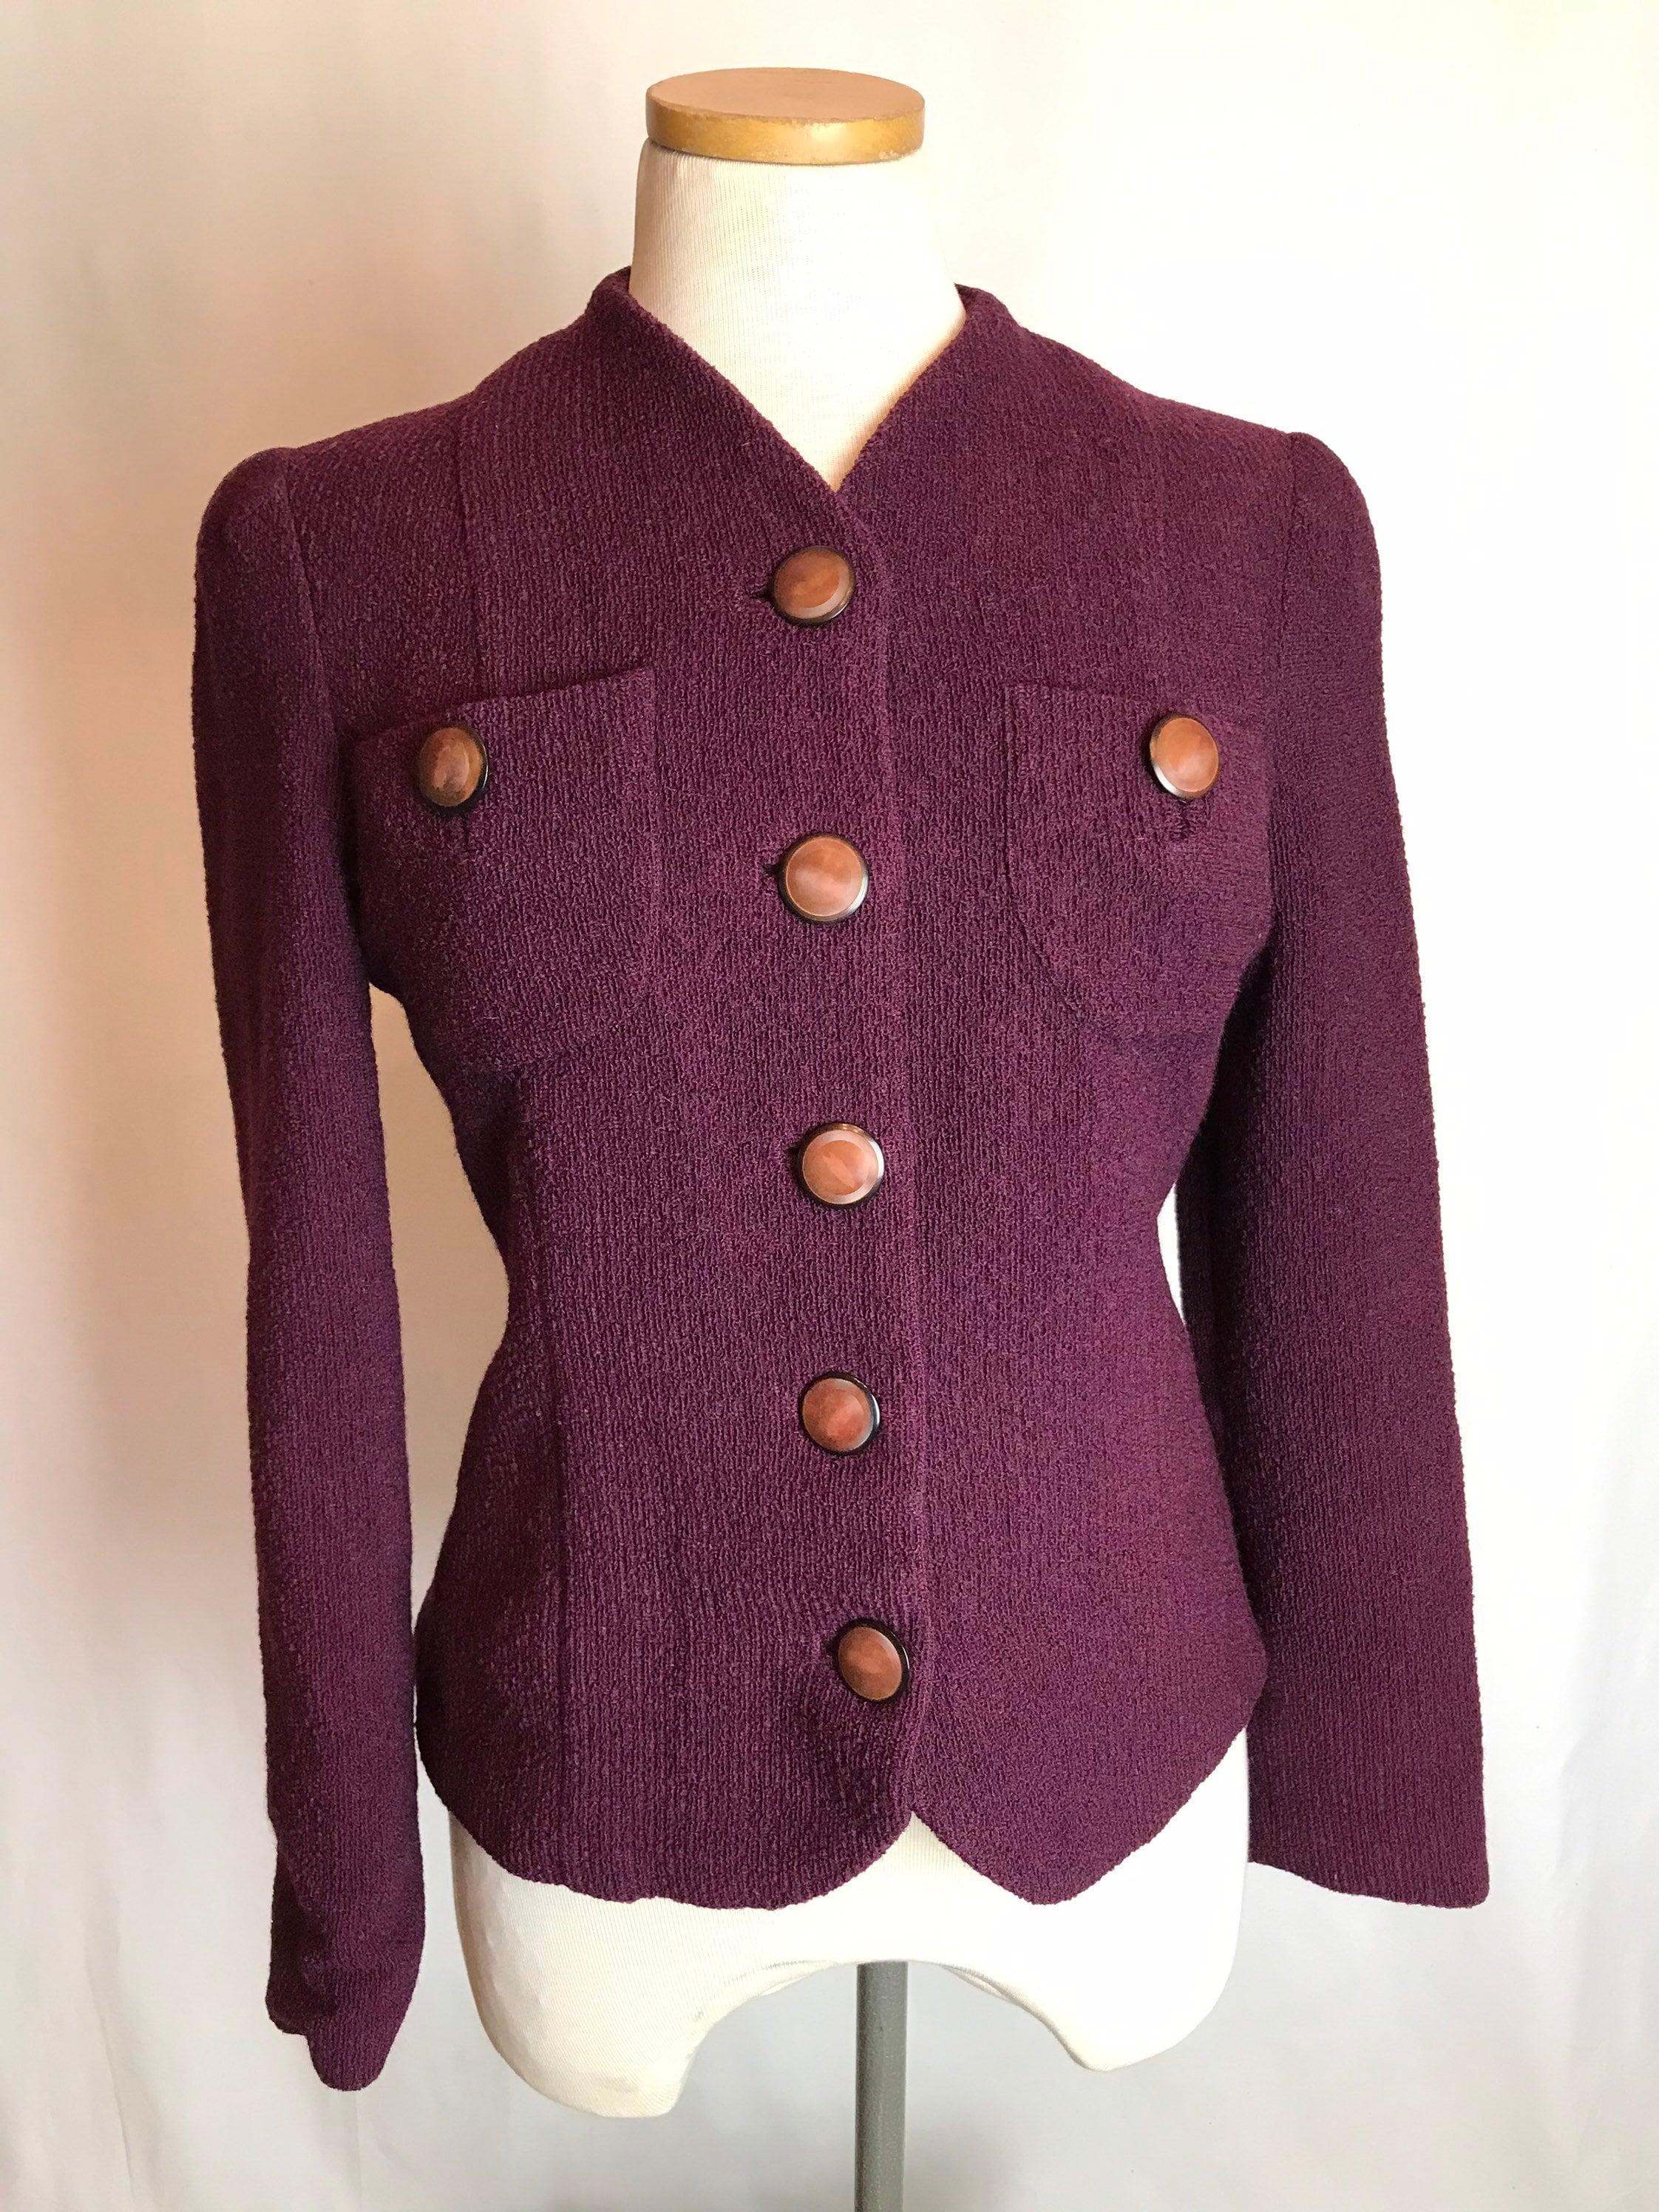 1950s Hats: Pillbox, Fascinator, Wedding, Sun Hats 50s Purple Wool Knit Blazer Fitted Womens Suit Jacket Plum Purple Nubby 1950s -60s Size Small 36 Bust $34.00 AT vintagedancer.com